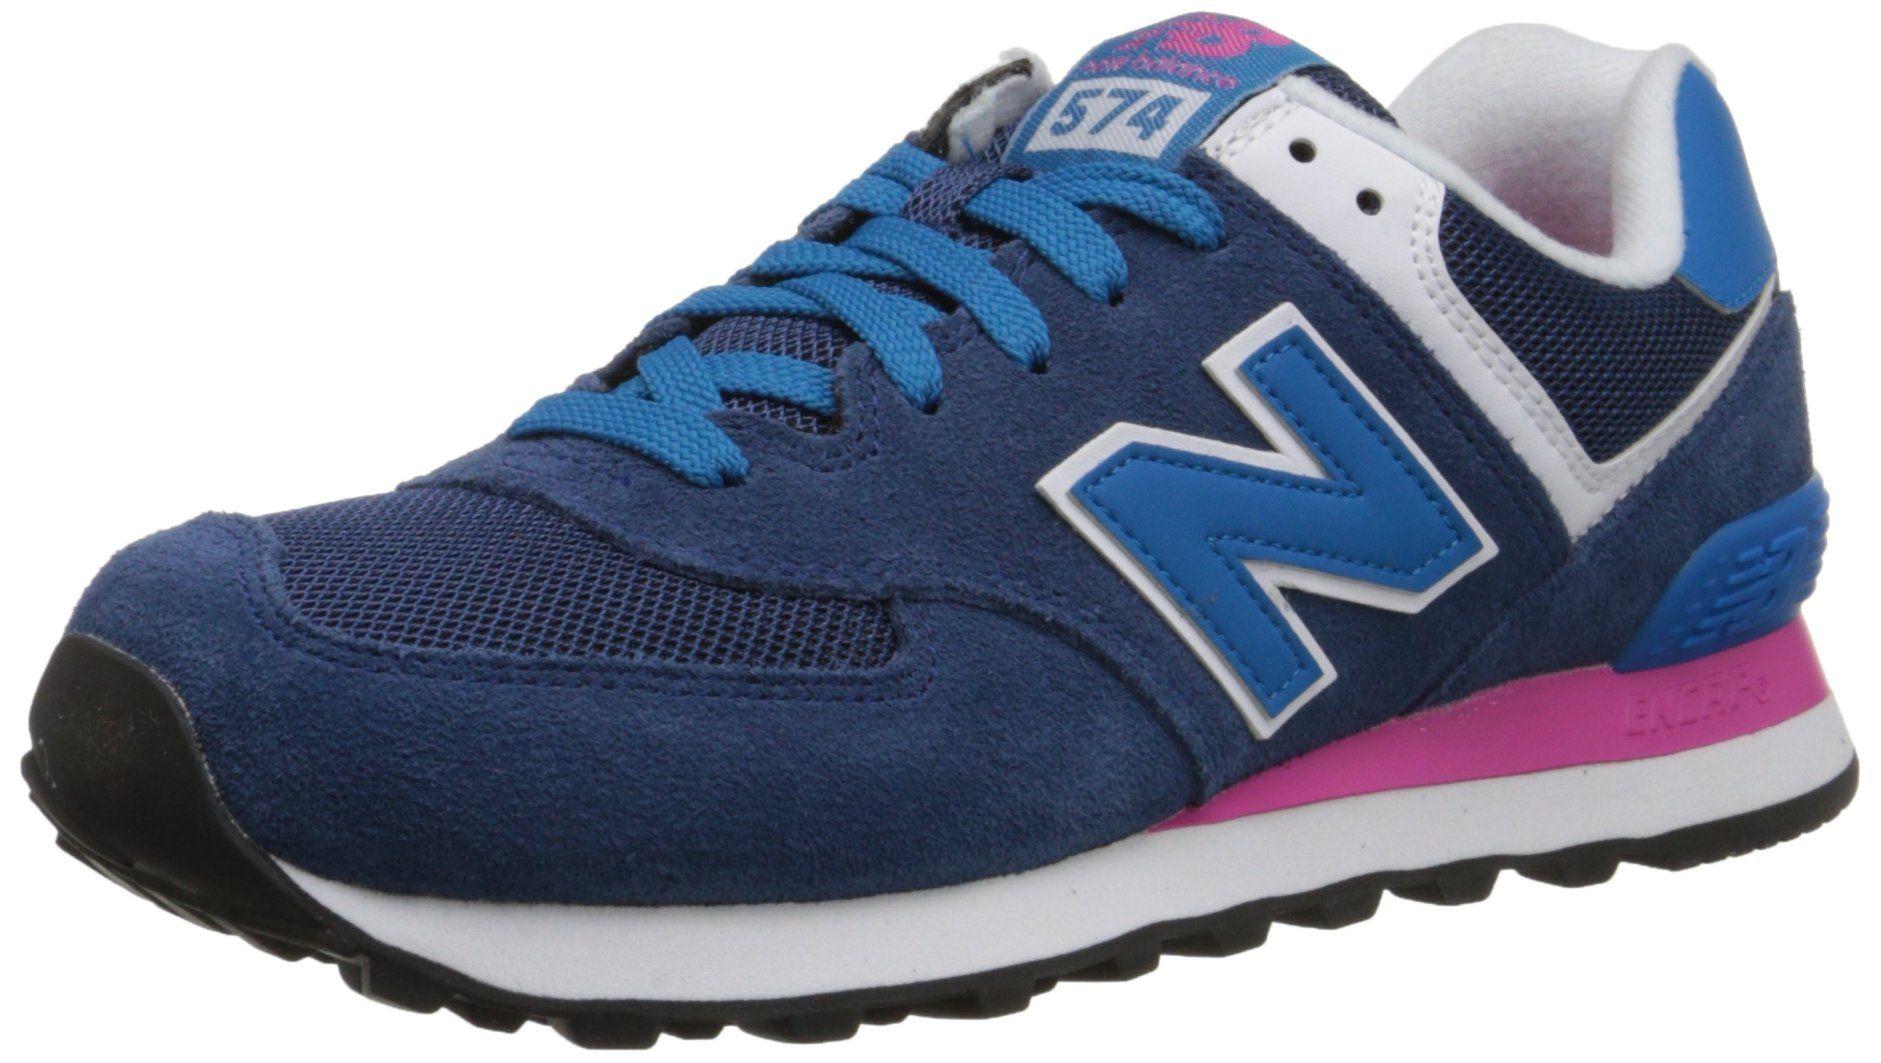 New Balance Women S Wl574 Core Plus Pack Running Shoe Blue Pink 7 B Us New Balance Women New Balance Sneakers